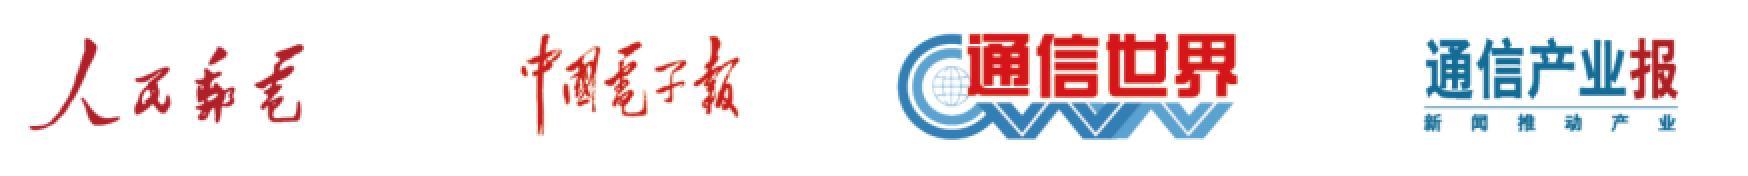 ICT中国·2021高层论坛